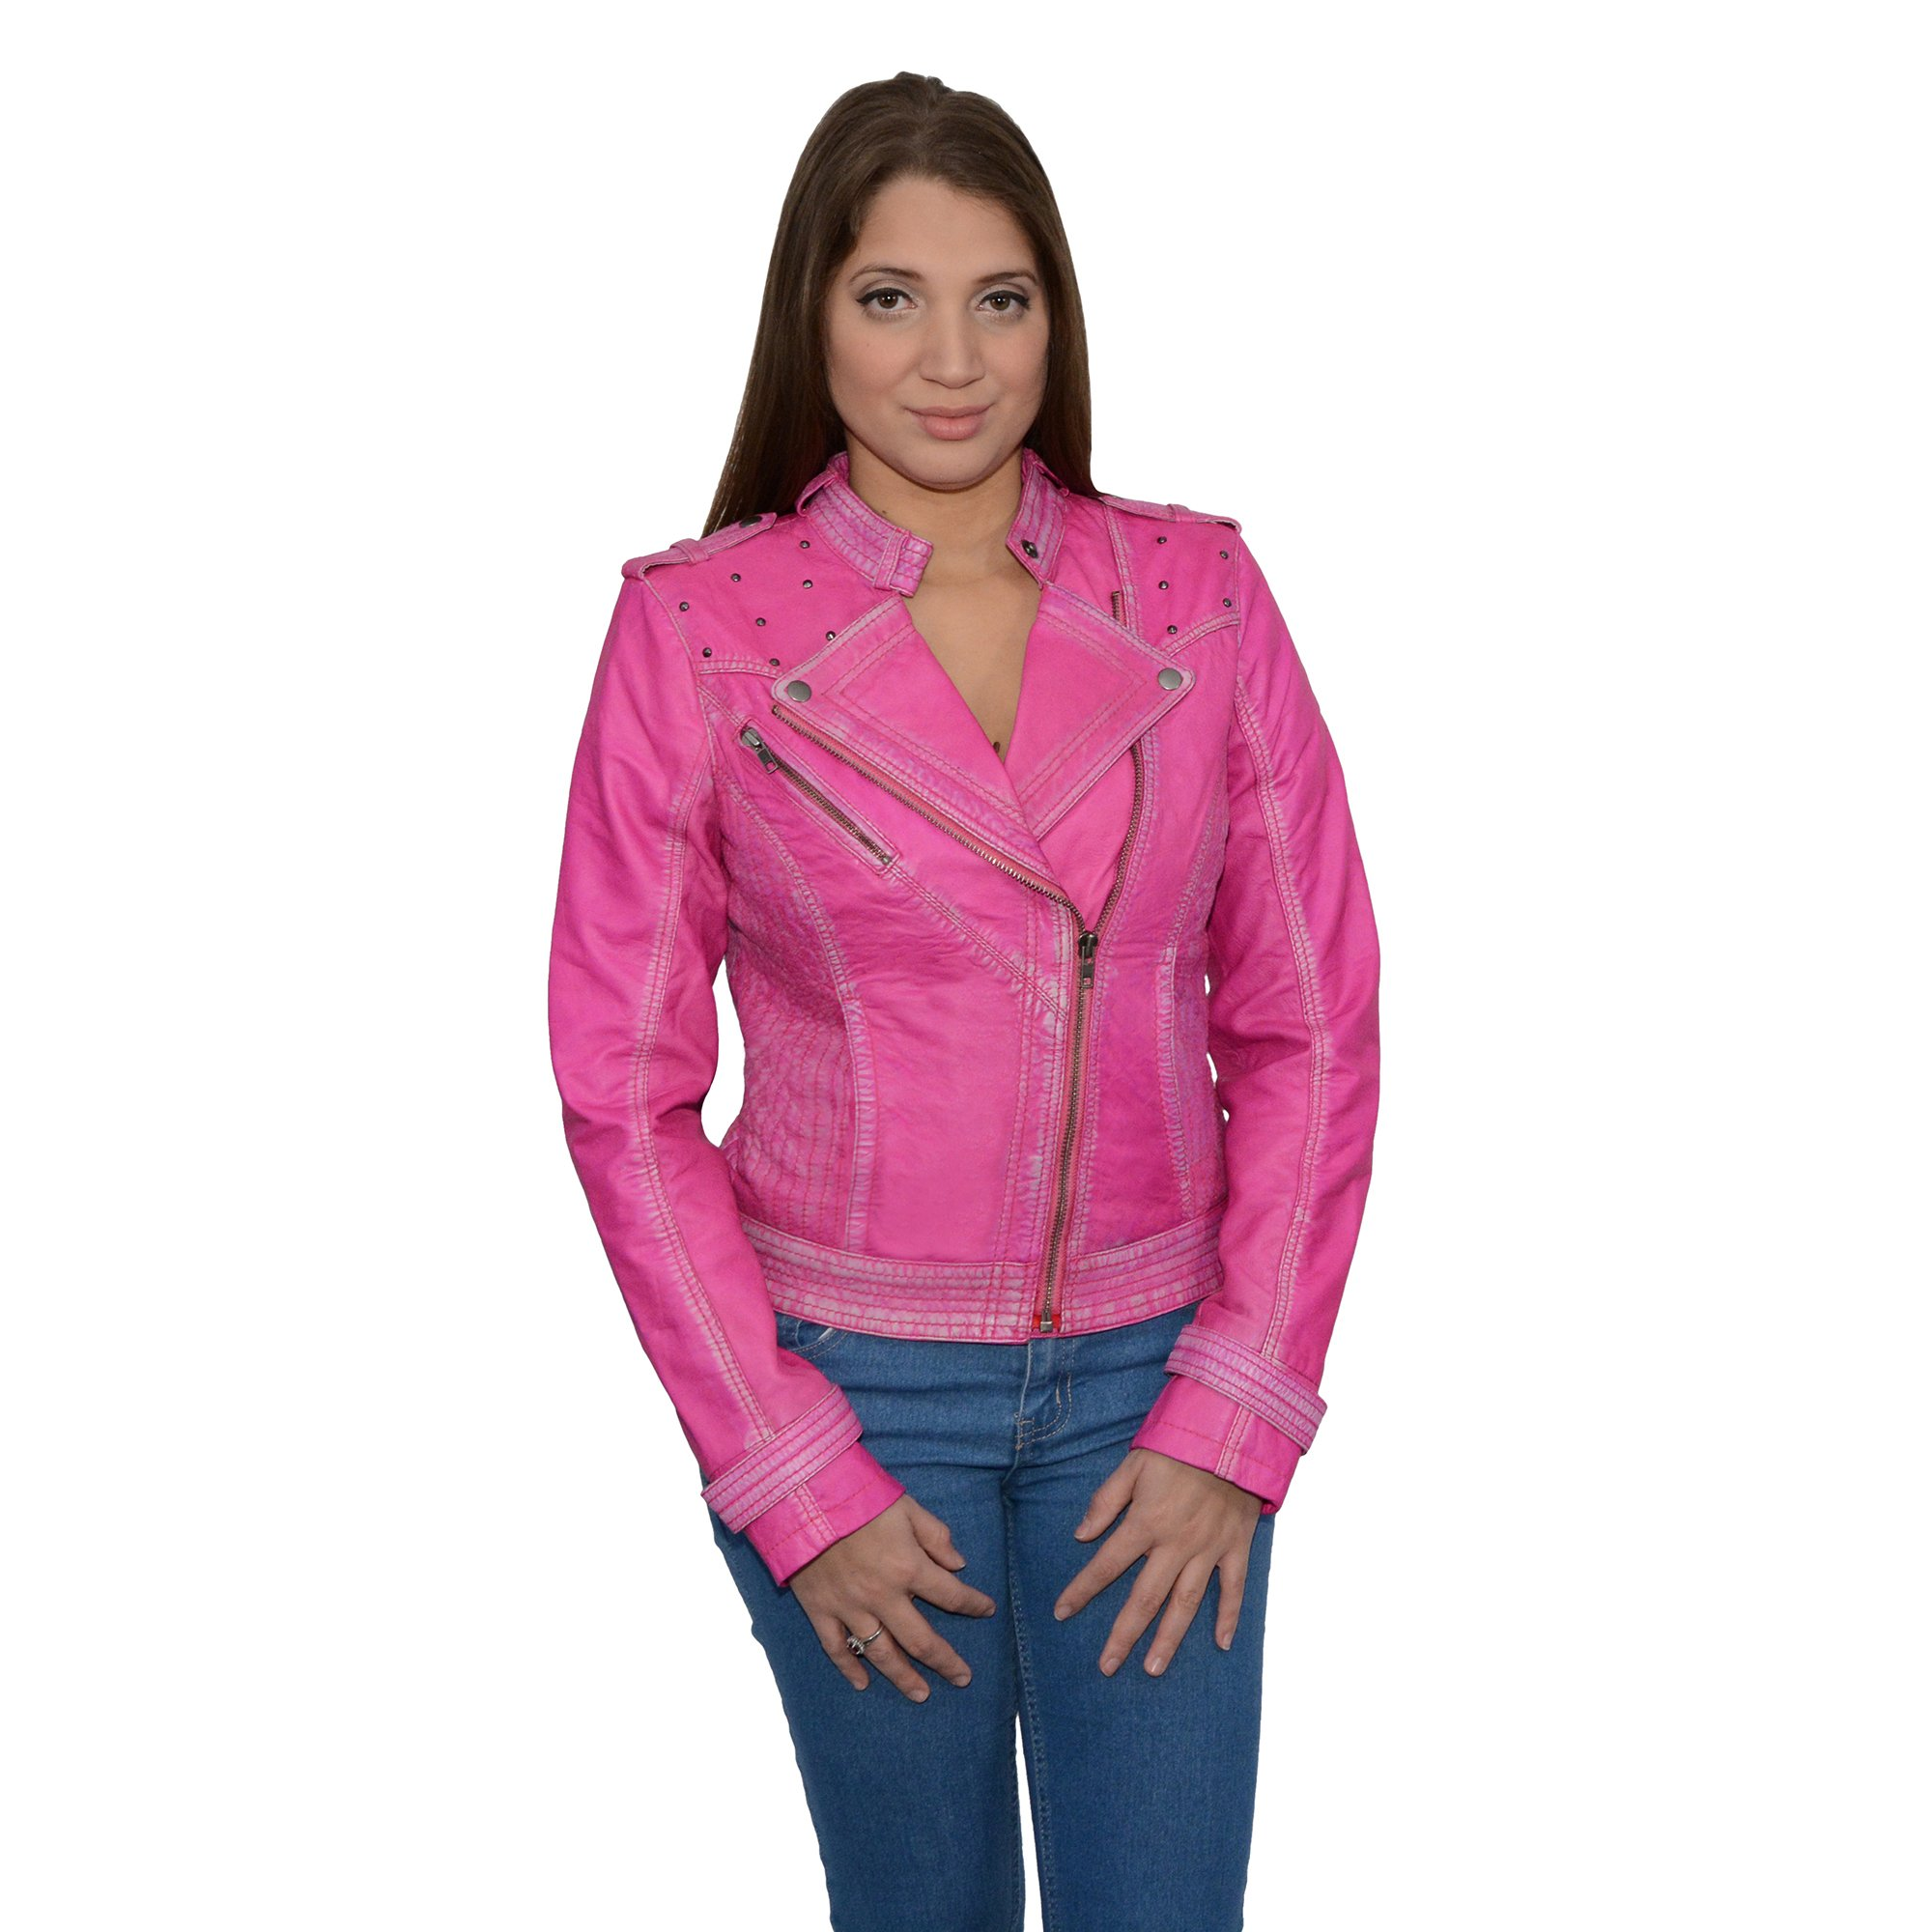 Milwaukee Leather Women's Sheepskin Asymmetrical Moto Jacket With Studding (Pink, X- Large), 1 Pack